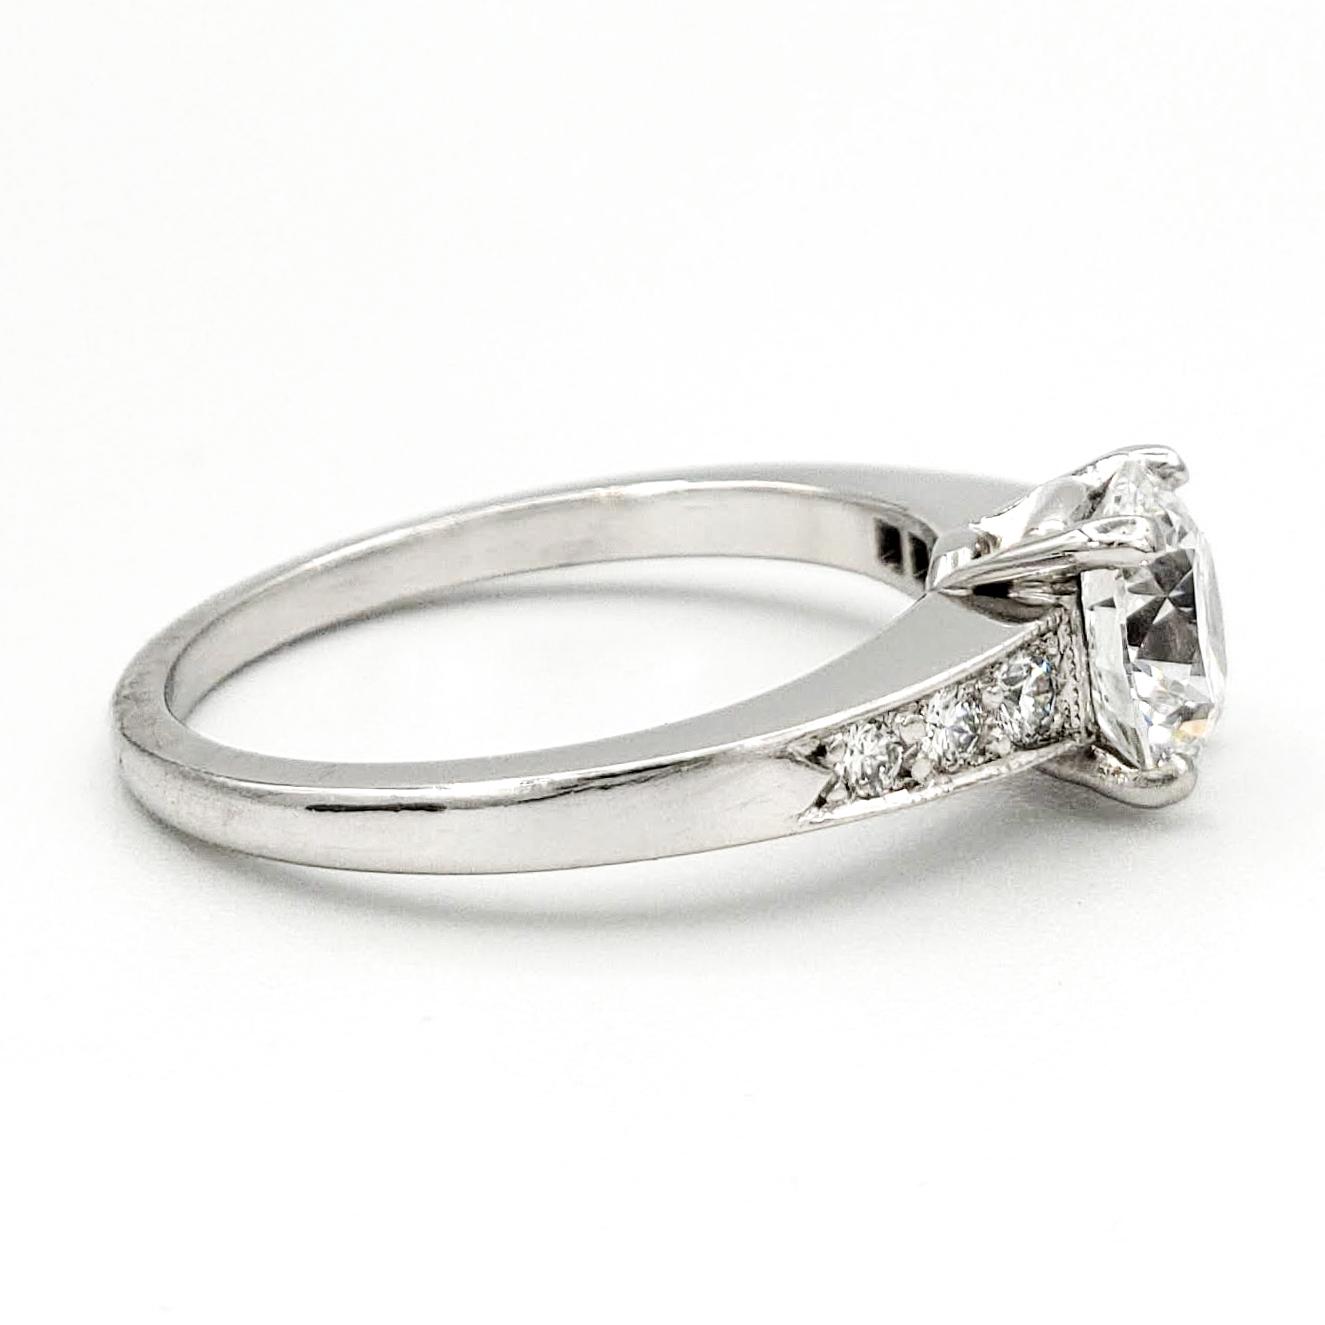 vintage-platinum-engagement-ring-with-1-04-round-brilliant-cut-diamond-gia-d-vvs2